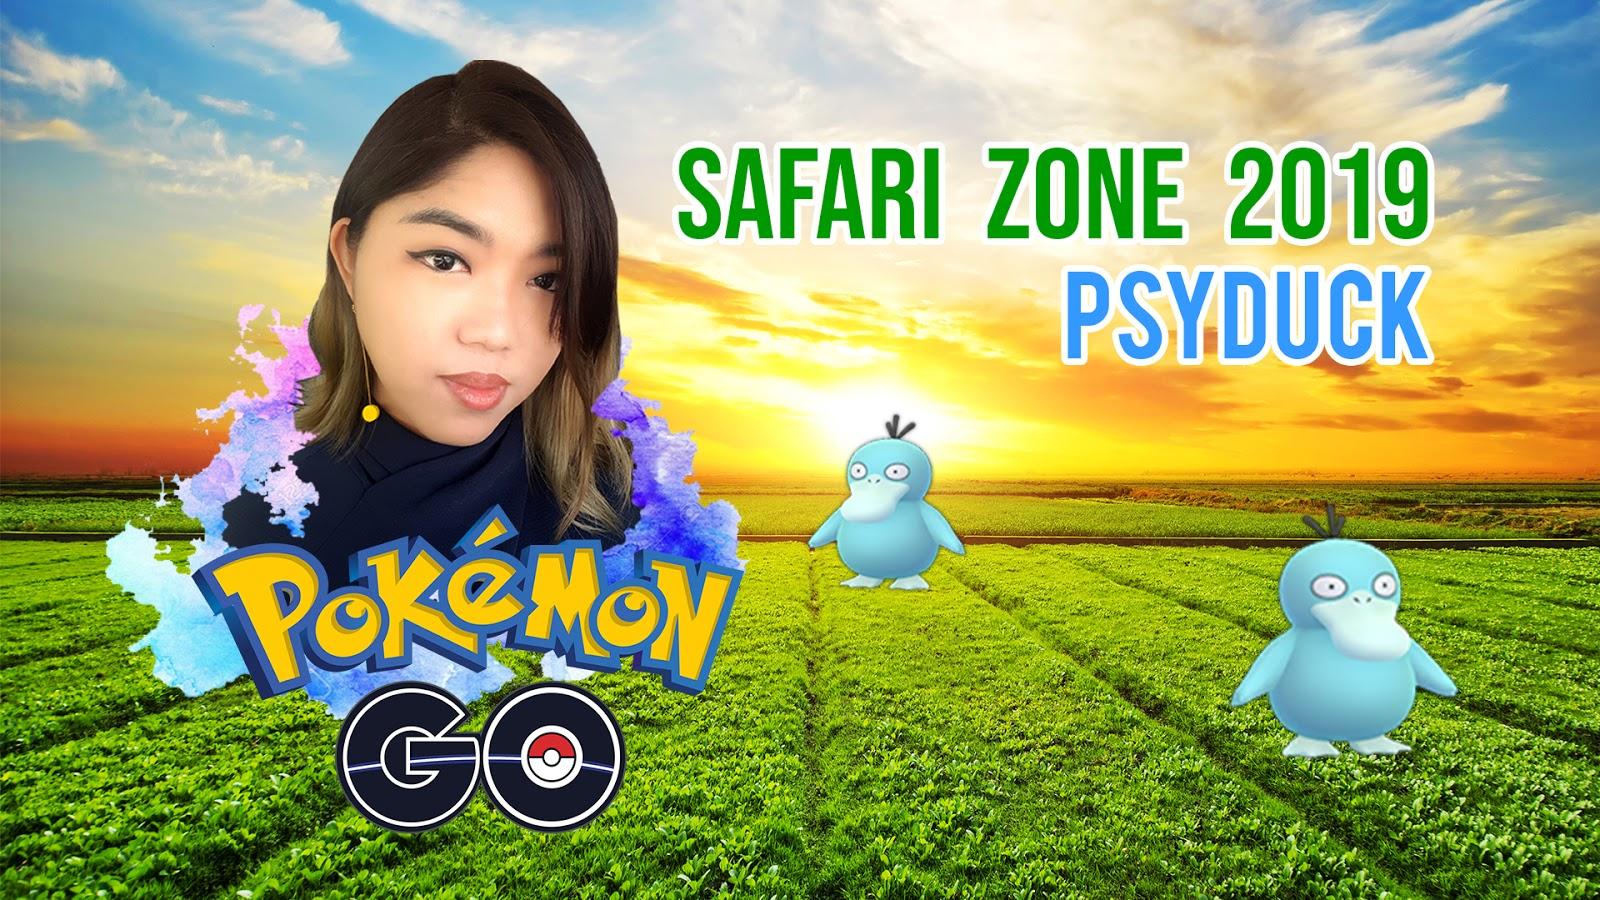 Pokemon Go: Safari Zone 2019: Brazil - Shiny Psyduck | It's